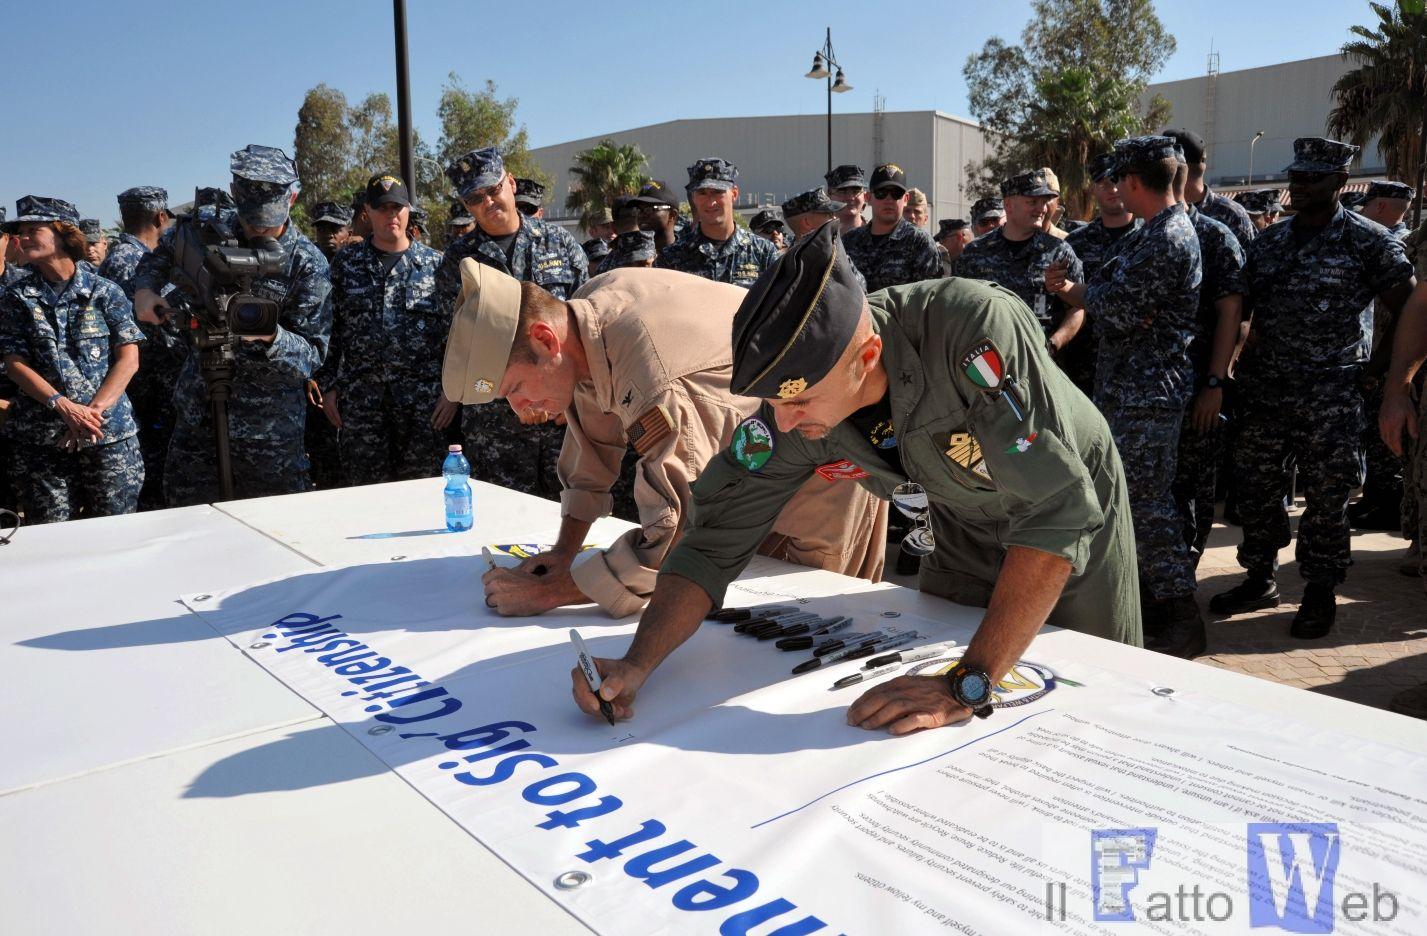 "Protocollo d'intesa "" Cittadino Modello "" 41° Stormo e U.S. Naval Air Station"